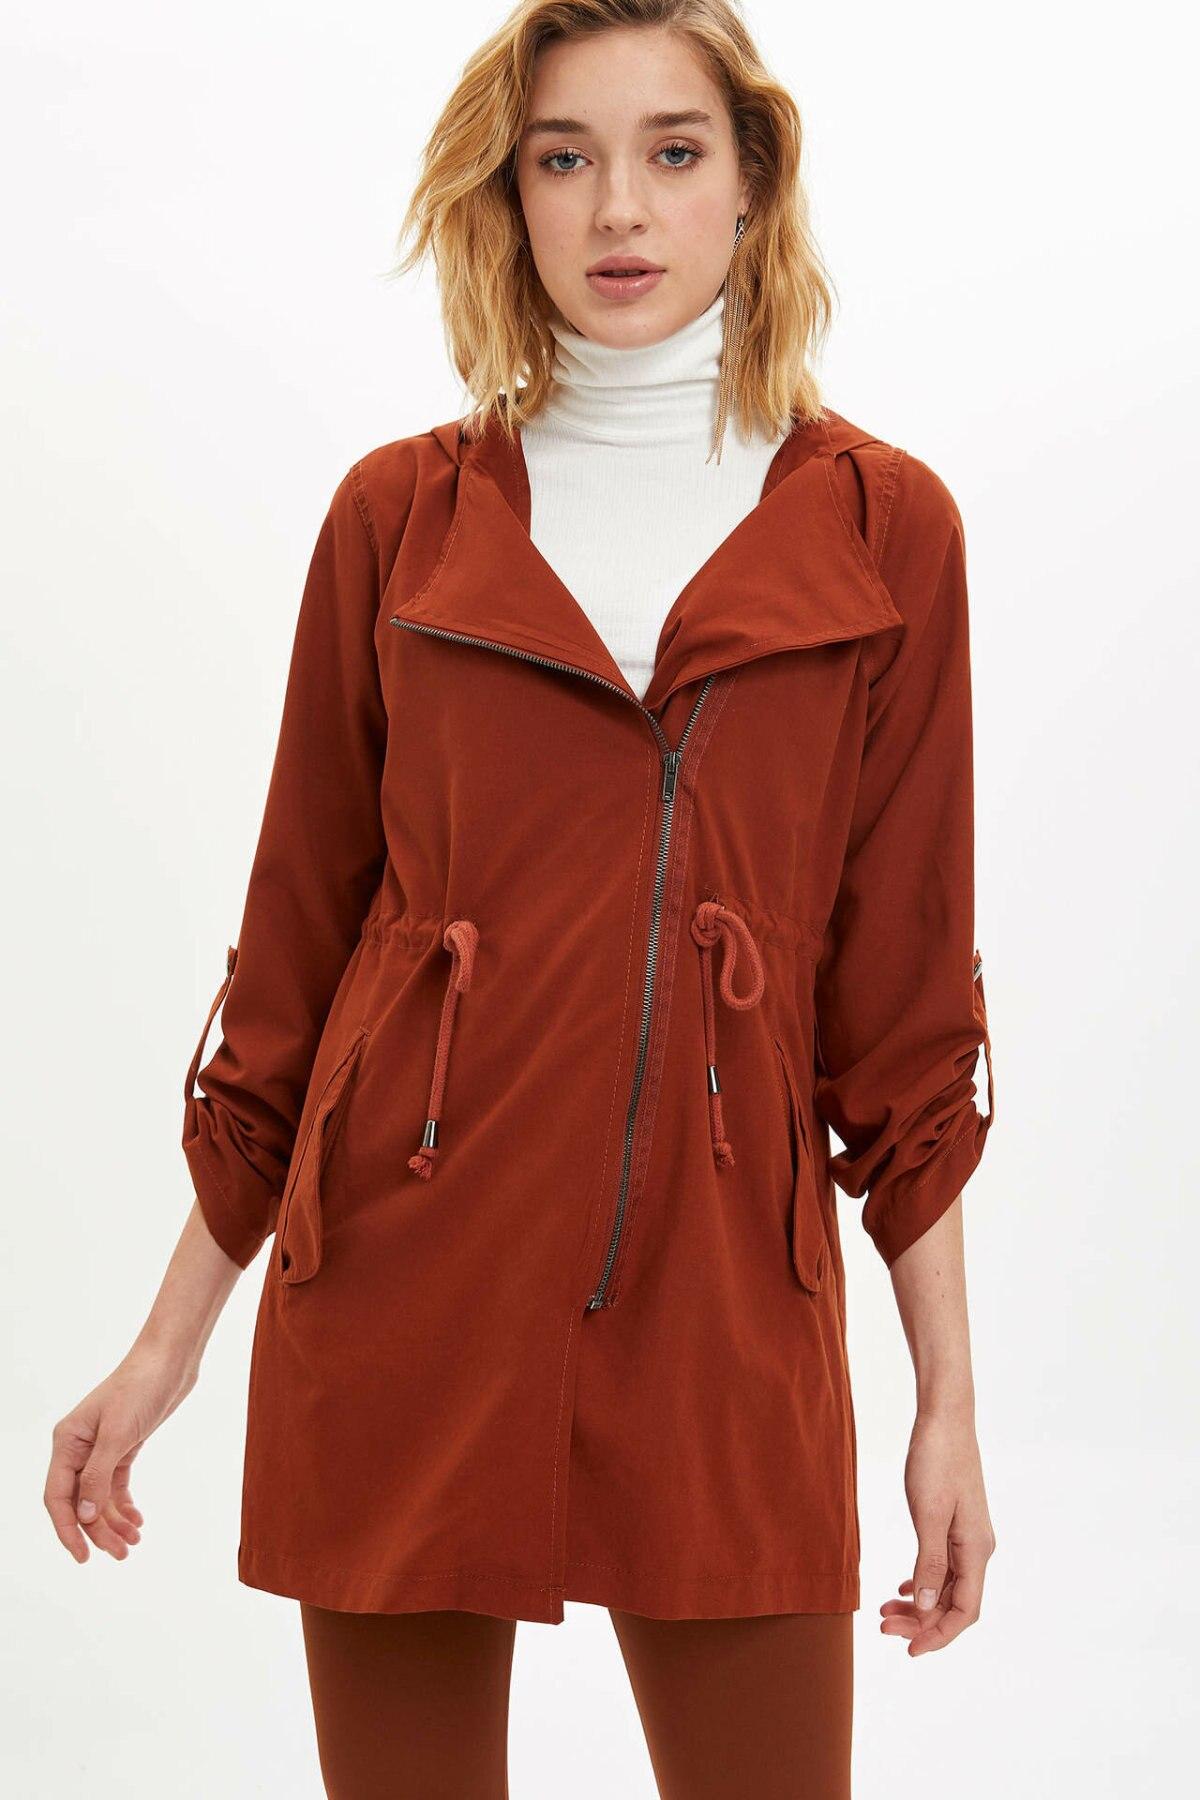 DeFacto Fashion Woman Hooded Light Parka Jackets Lace-up Solid Zipper Pockets Coats For Women's Casual Jacket Ladies-L8529AZ19AU